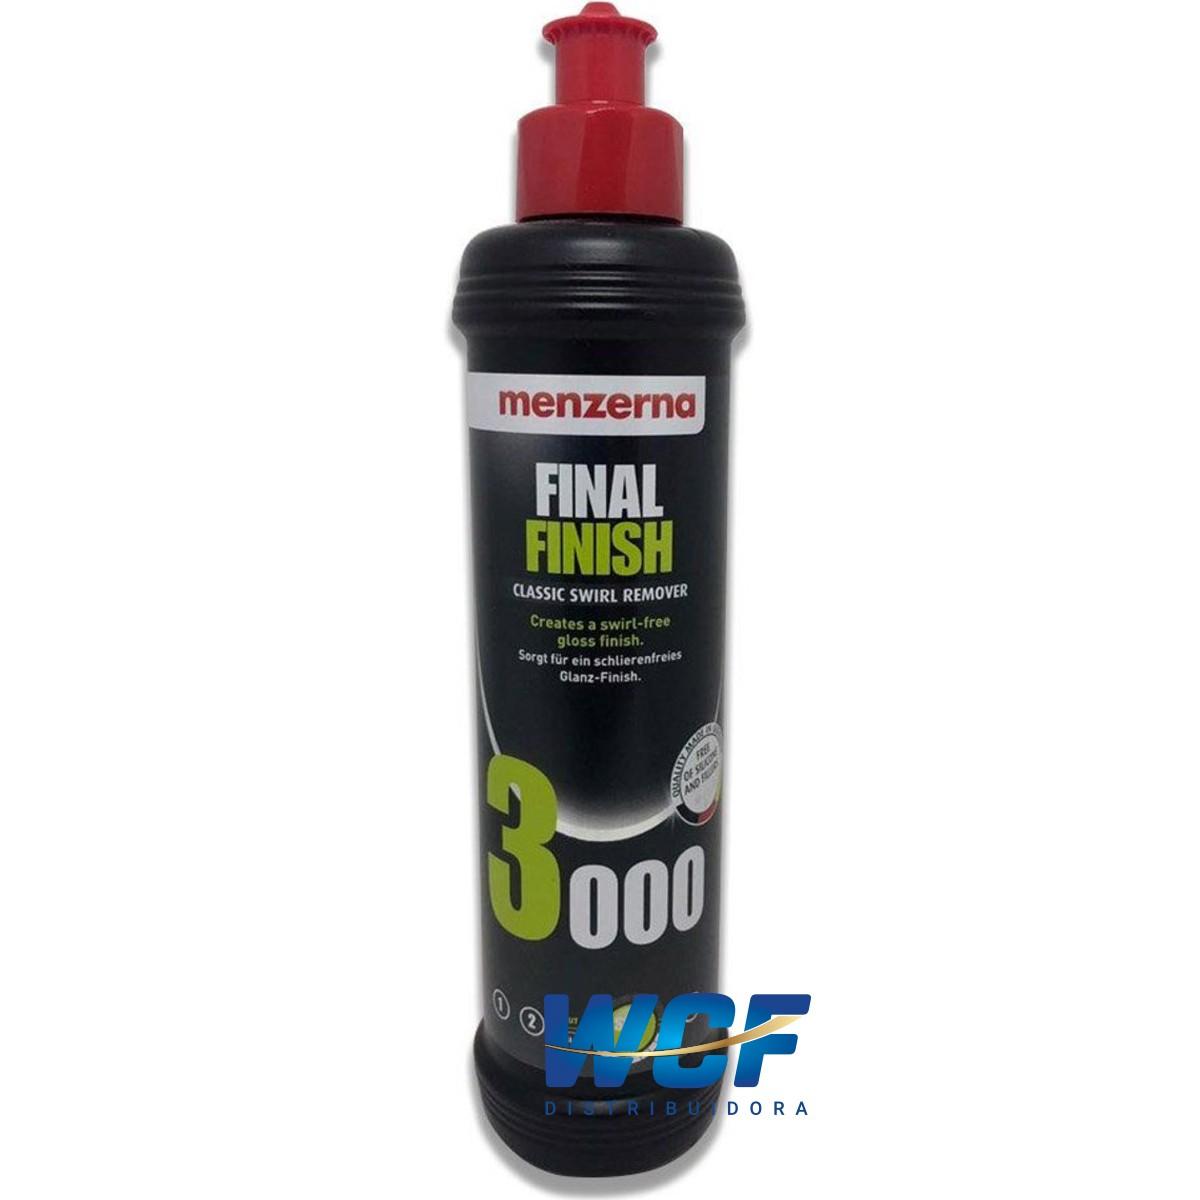 FINAL FINISH 3000 CLASSIC SWIRL REMOVER 250ML MENZERNA